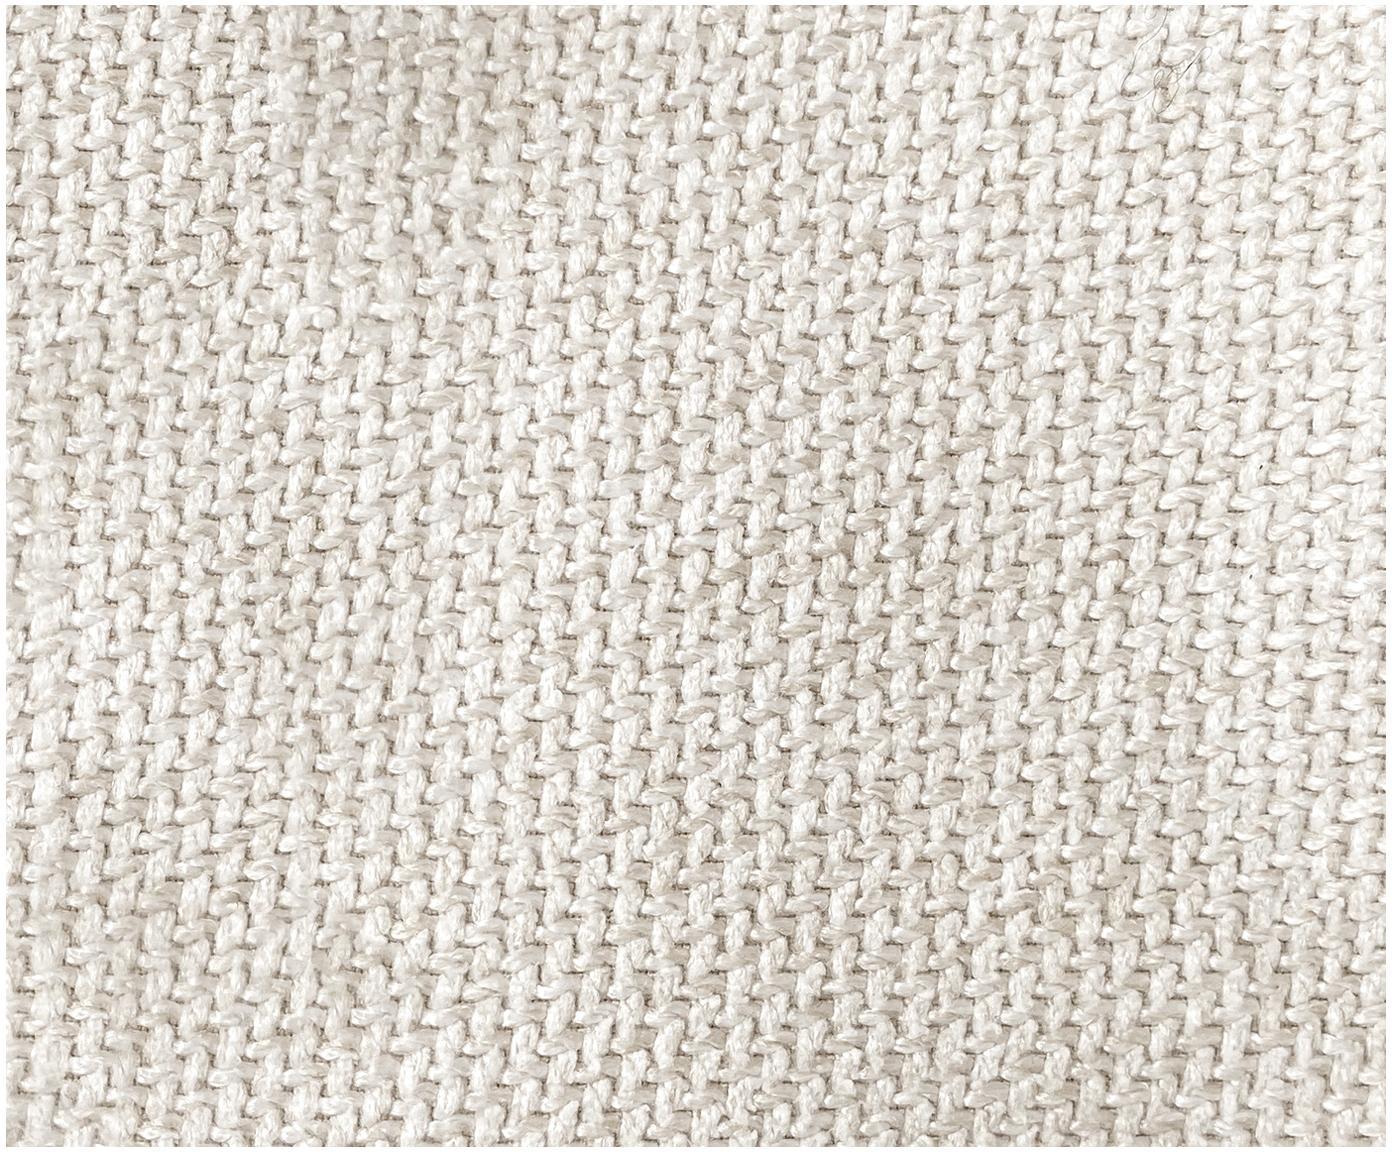 Modulare XL-Ottomane Lennon, Bezug: Polyester 35.000 Scheuert, Gestell: Massives Kiefernholz, Spe, Webstoff Beige, B 357 x T 119 cm